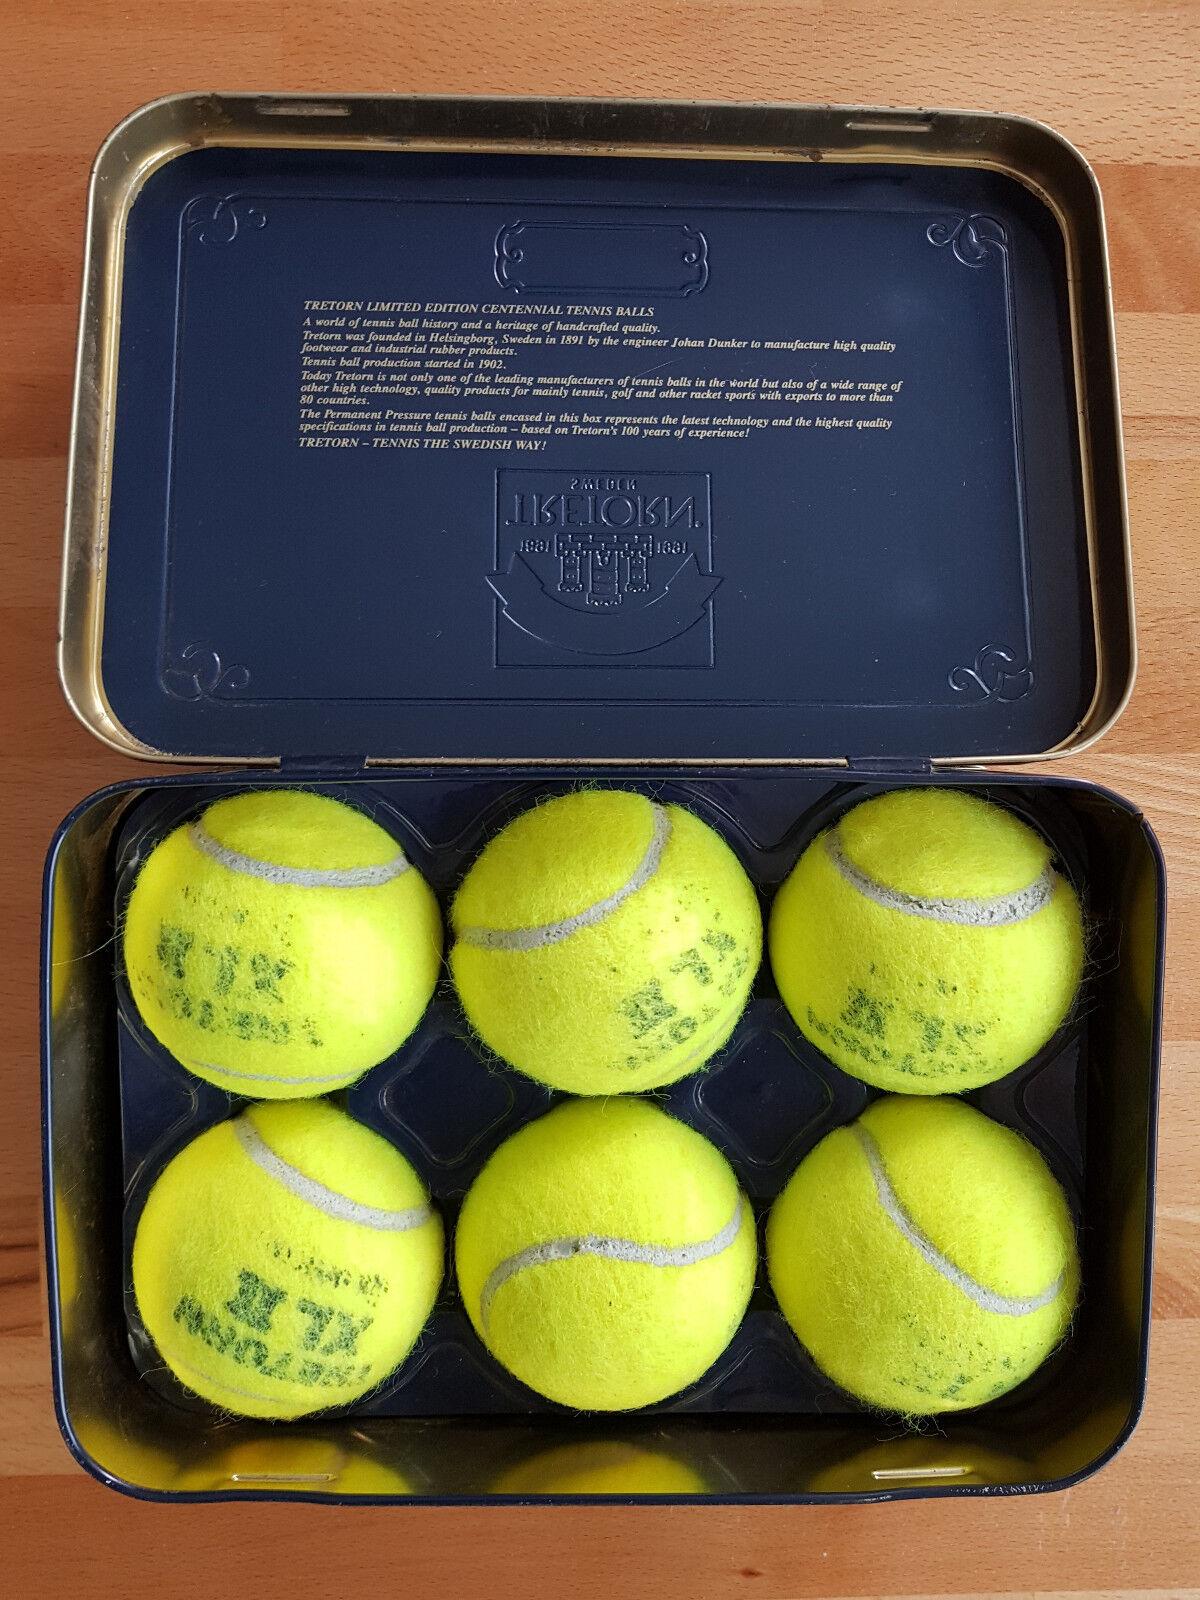 Tretorn Limited Edition Centennial Tennis Balls Sweden 100 Years 1891 - 1991